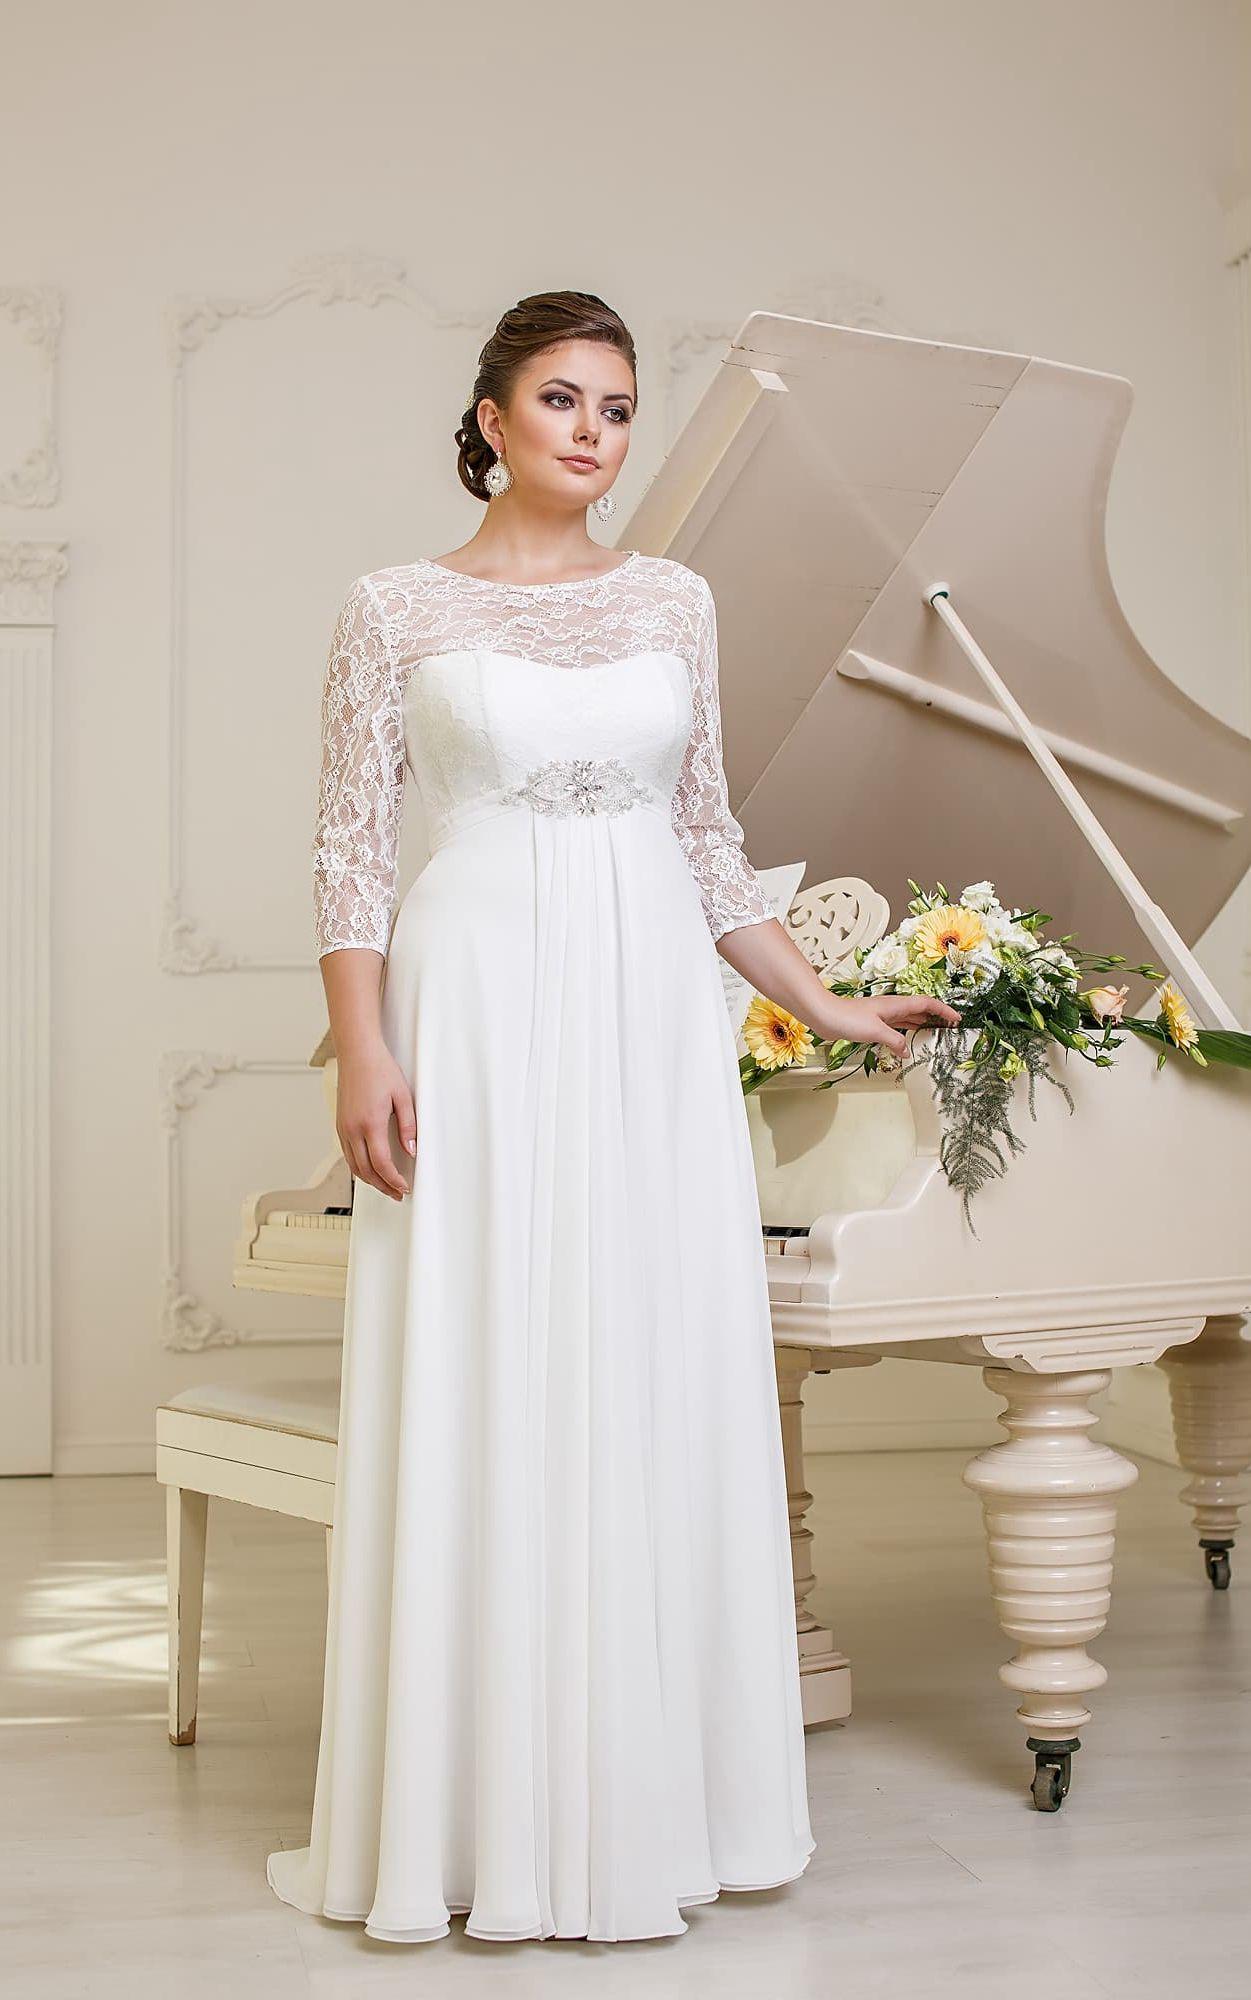 A Line Long Jewel Neck Illusion Sleeve Empire Corset Back Chiffon Dress With Beading And Pleatings Empire Wedding Dress Empire Waist Wedding Dress Wedding Dresses Plus Size